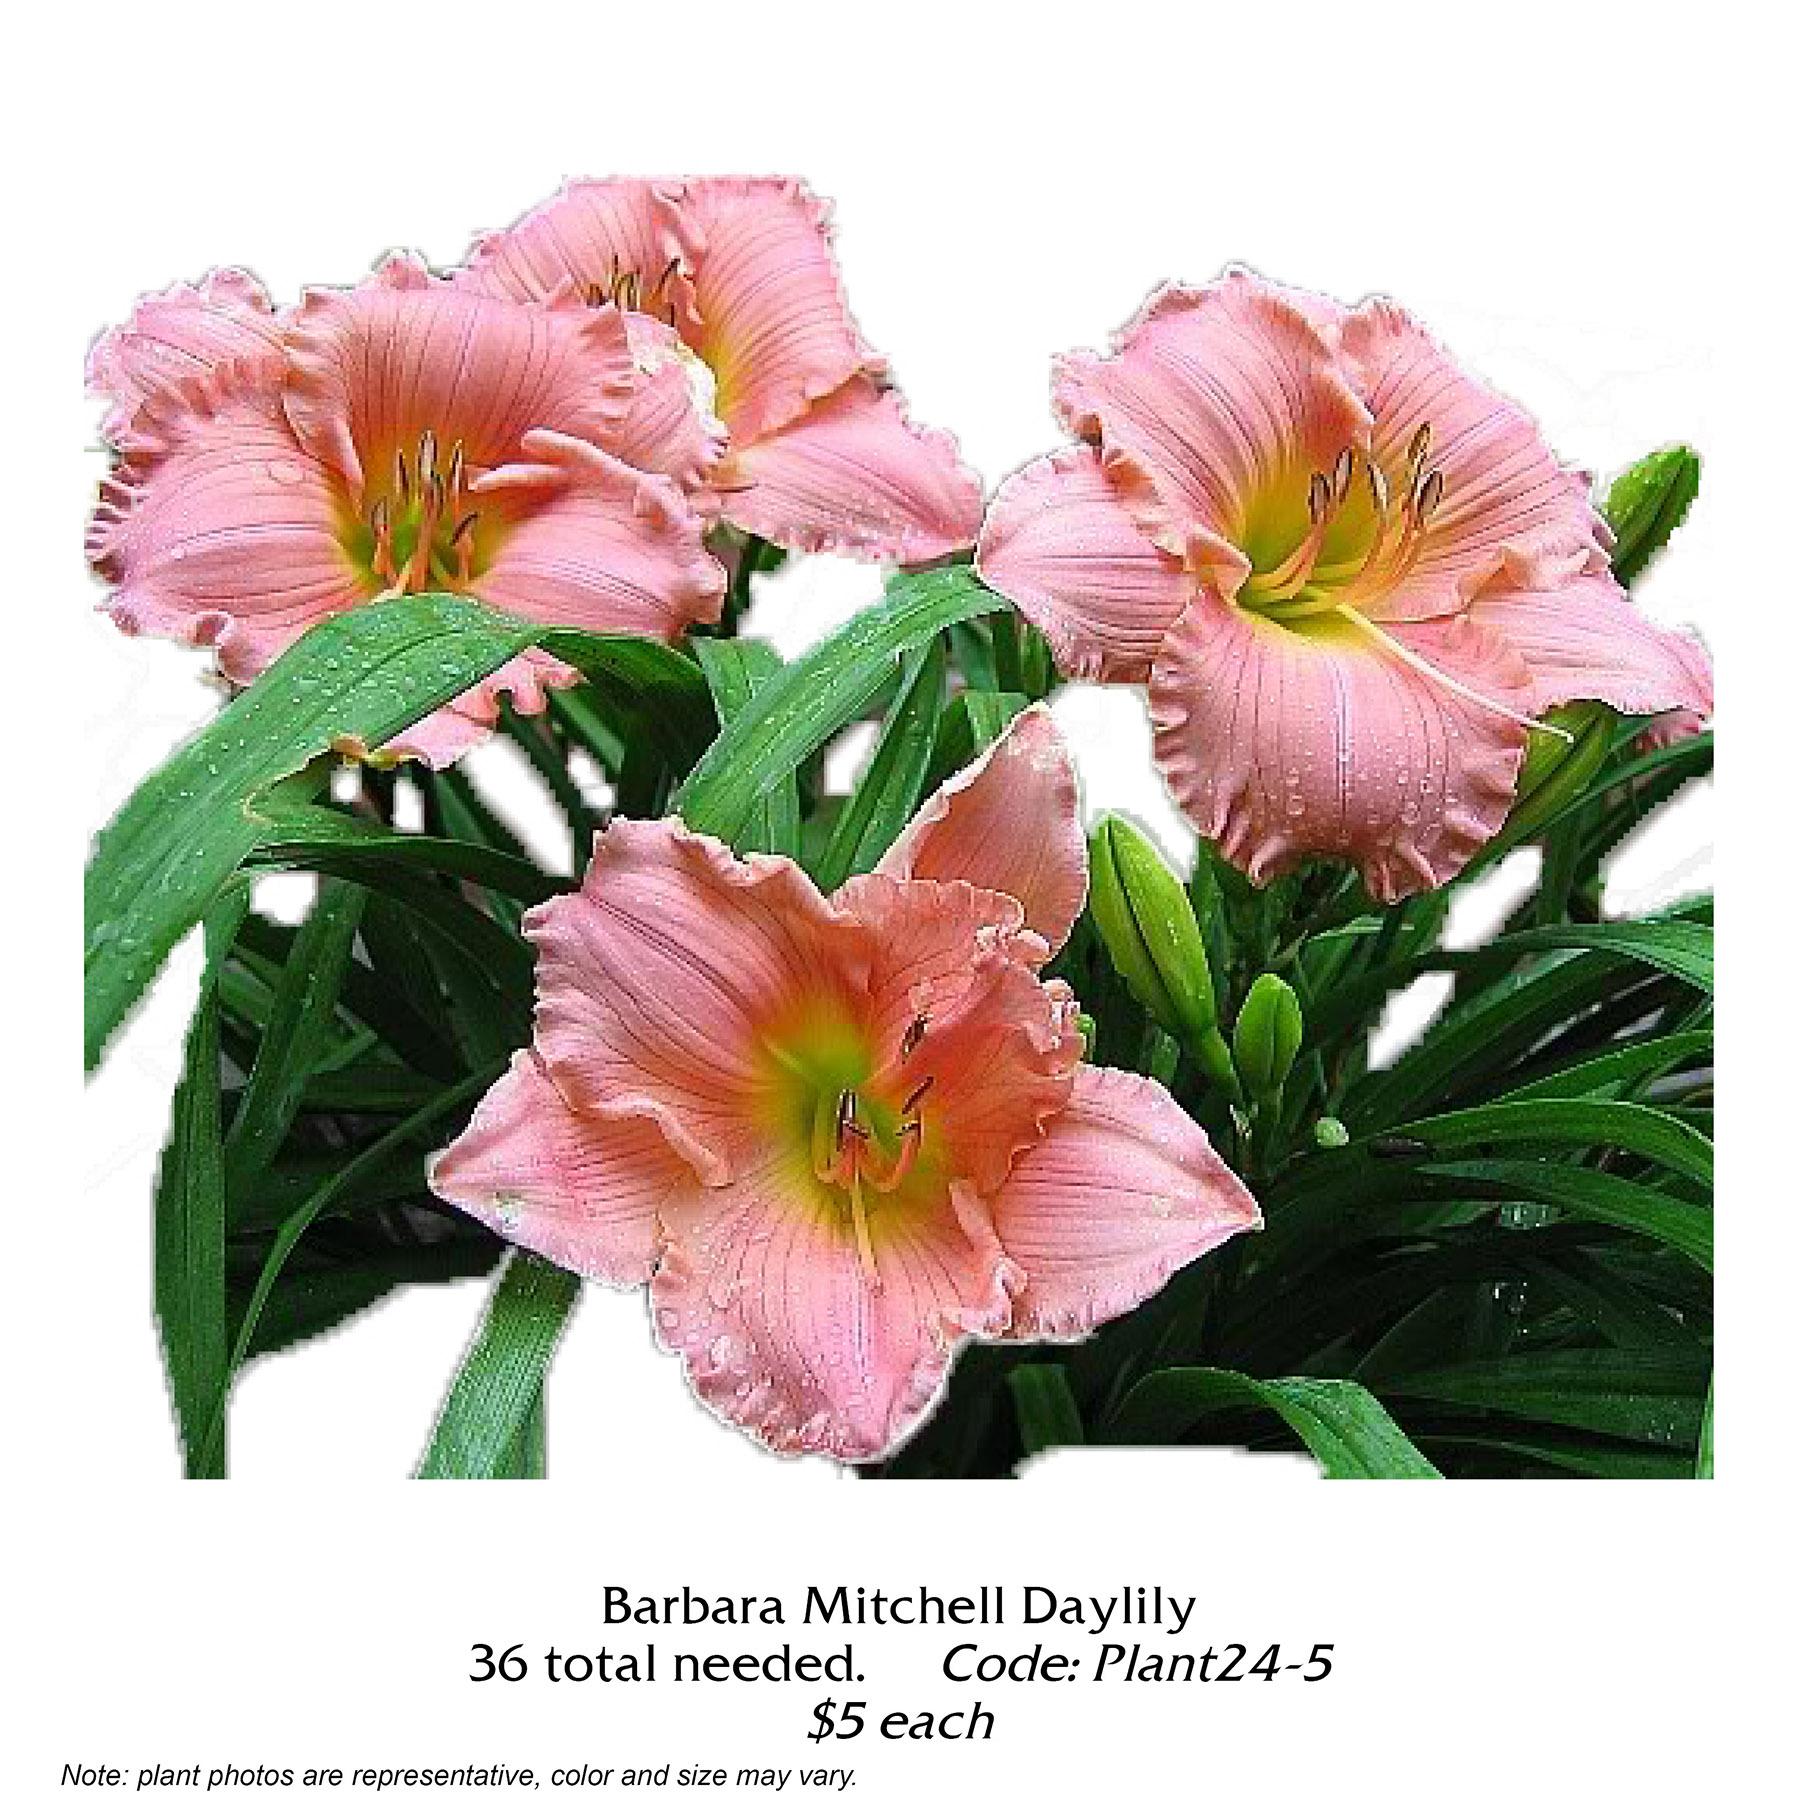 Barbara Mitchell Daylily.jpg